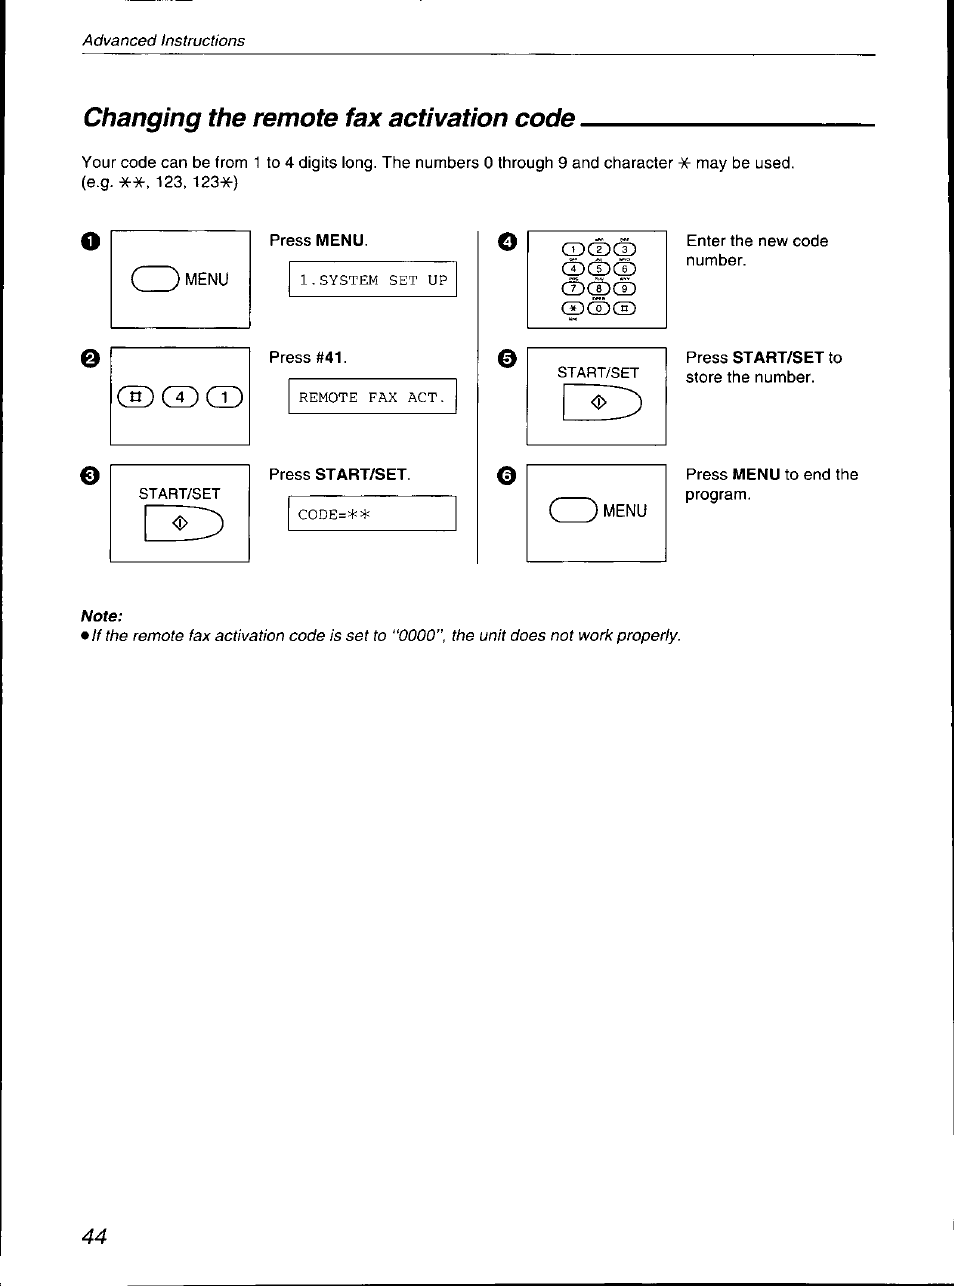 changing the remote fax activation code panasonic kx f700 user rh manualsdir com Panasonic Kx 390 B Manual Panasonic Kx Cordless Phone Manual